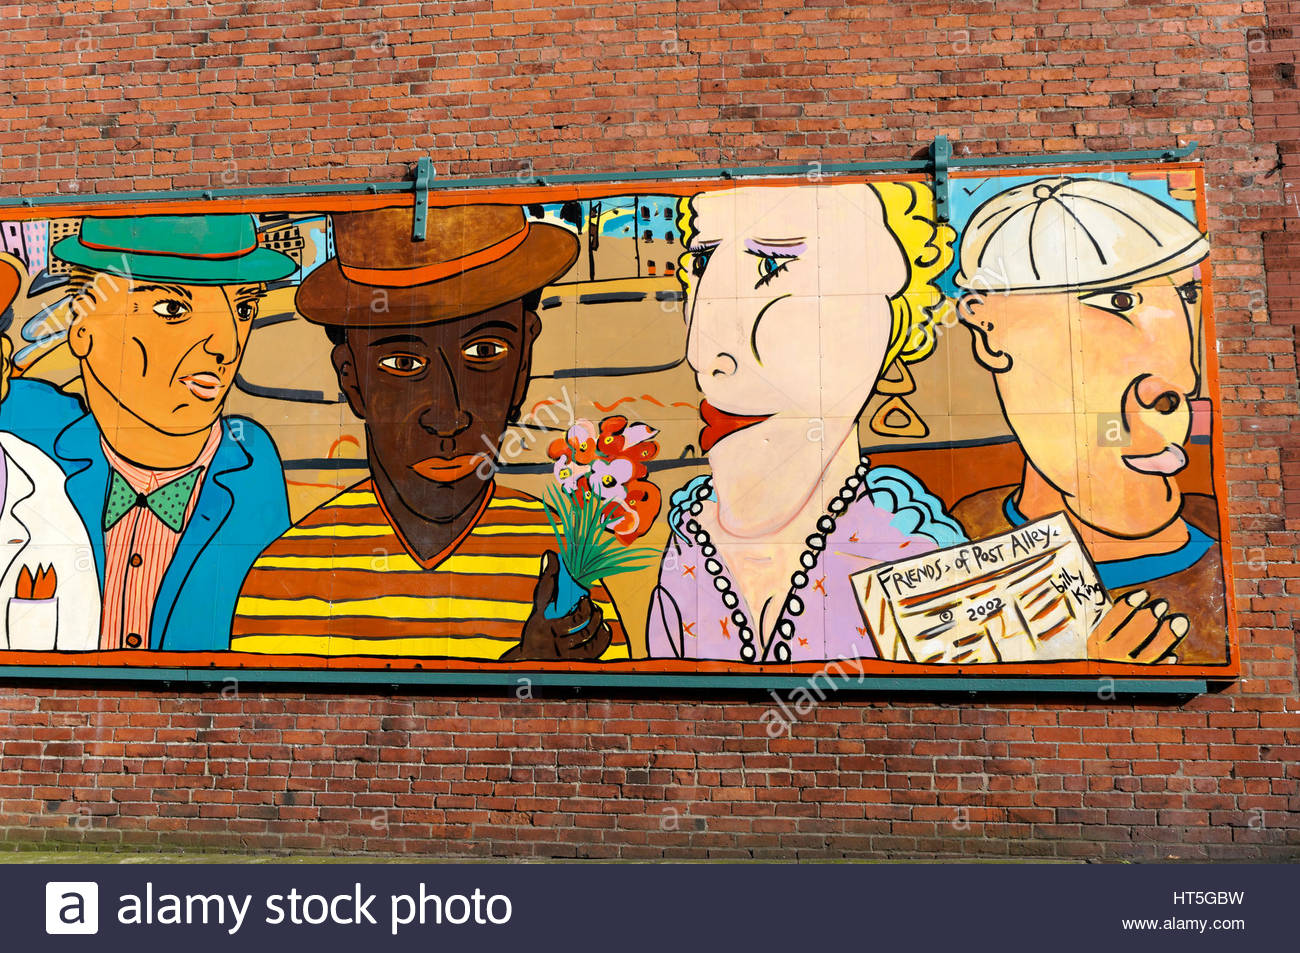 Straße Wandbild mit dem Titel Freunde Post Gasse im Stadtteil Pioneer Square, Seattle, Washington, USA Stockbild